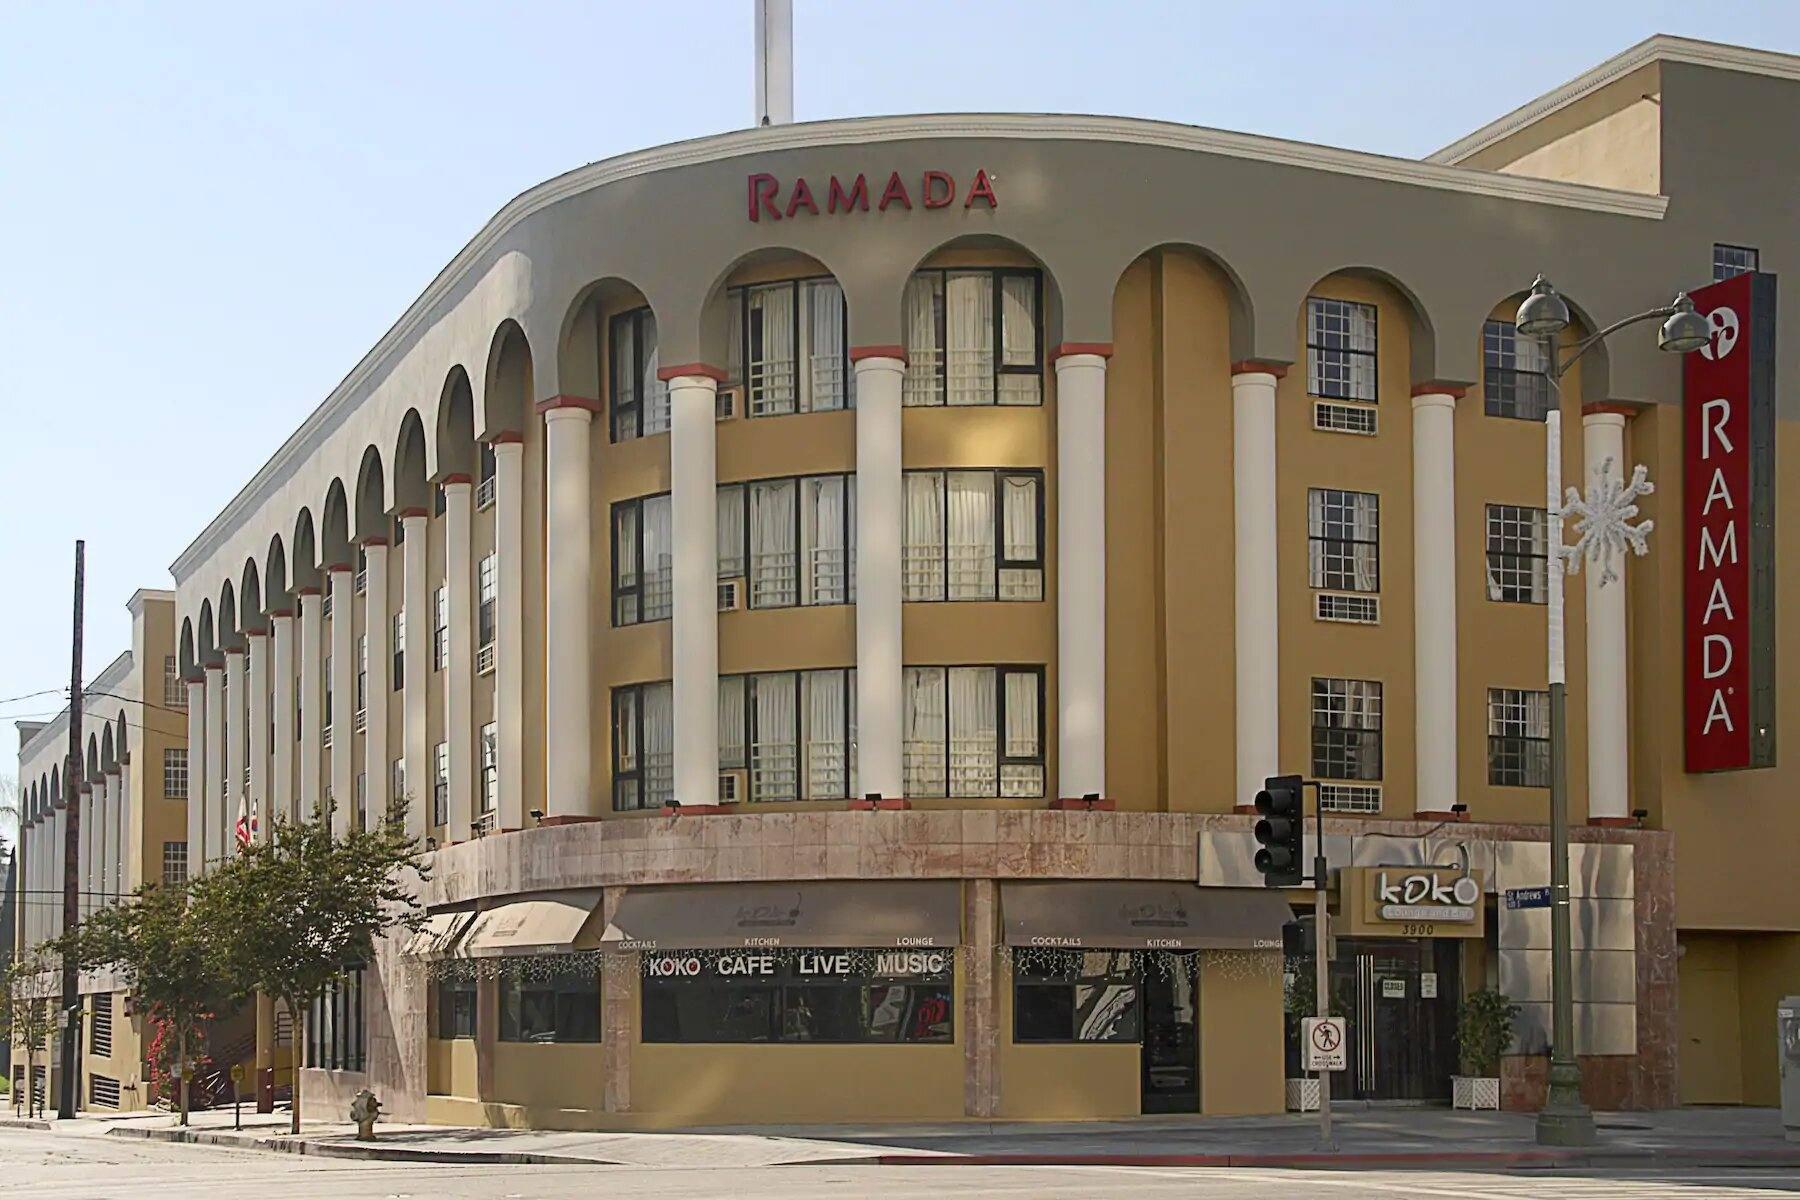 Exterior of Ramada by Wyndham Los Angeles / Koreatown West